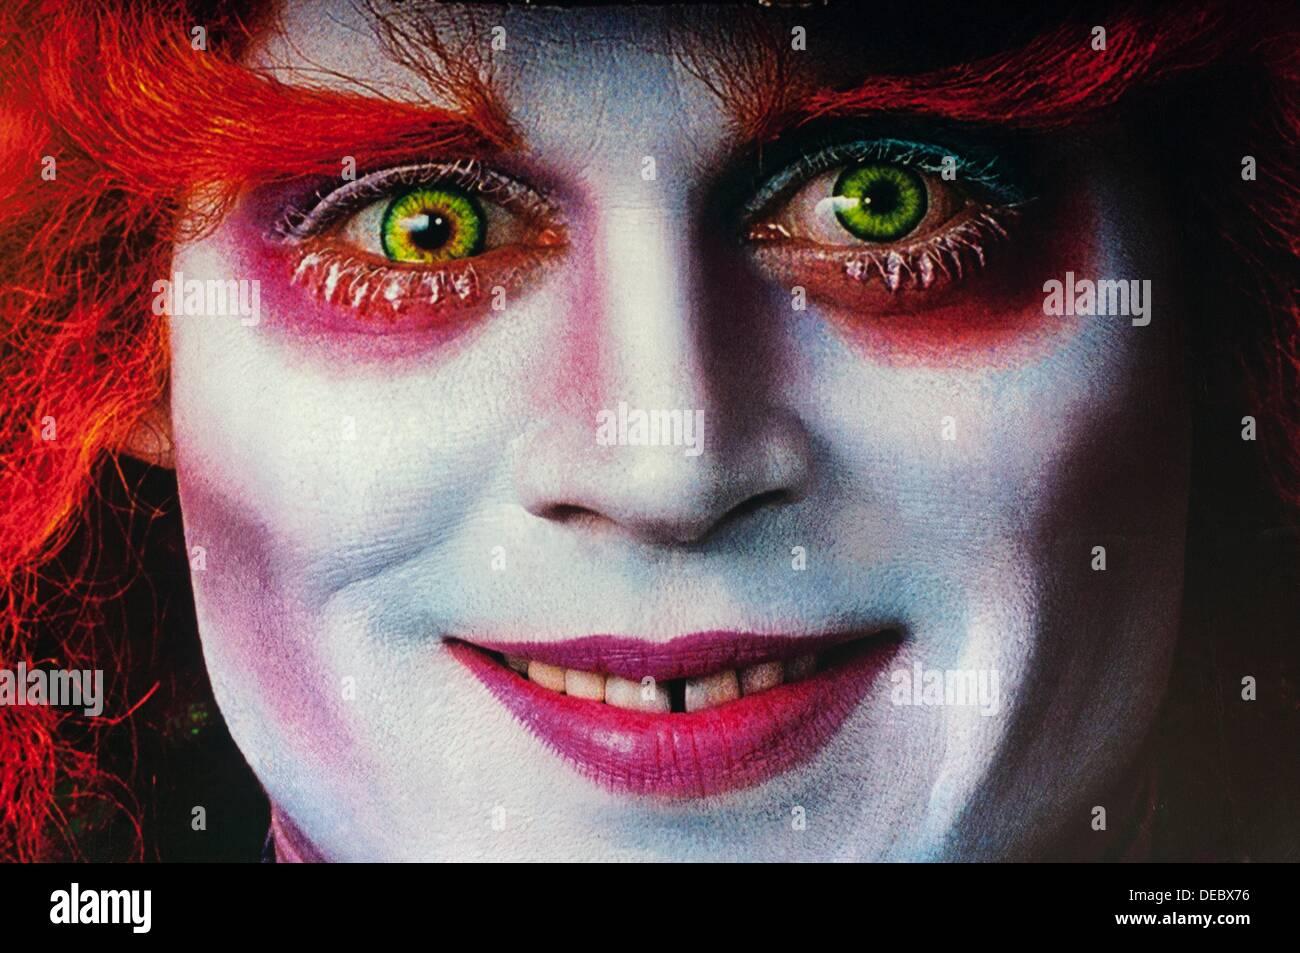 Tim Burton´s Alice In Wonderland Movie billboard detail. London, January 2011 - Stock Image